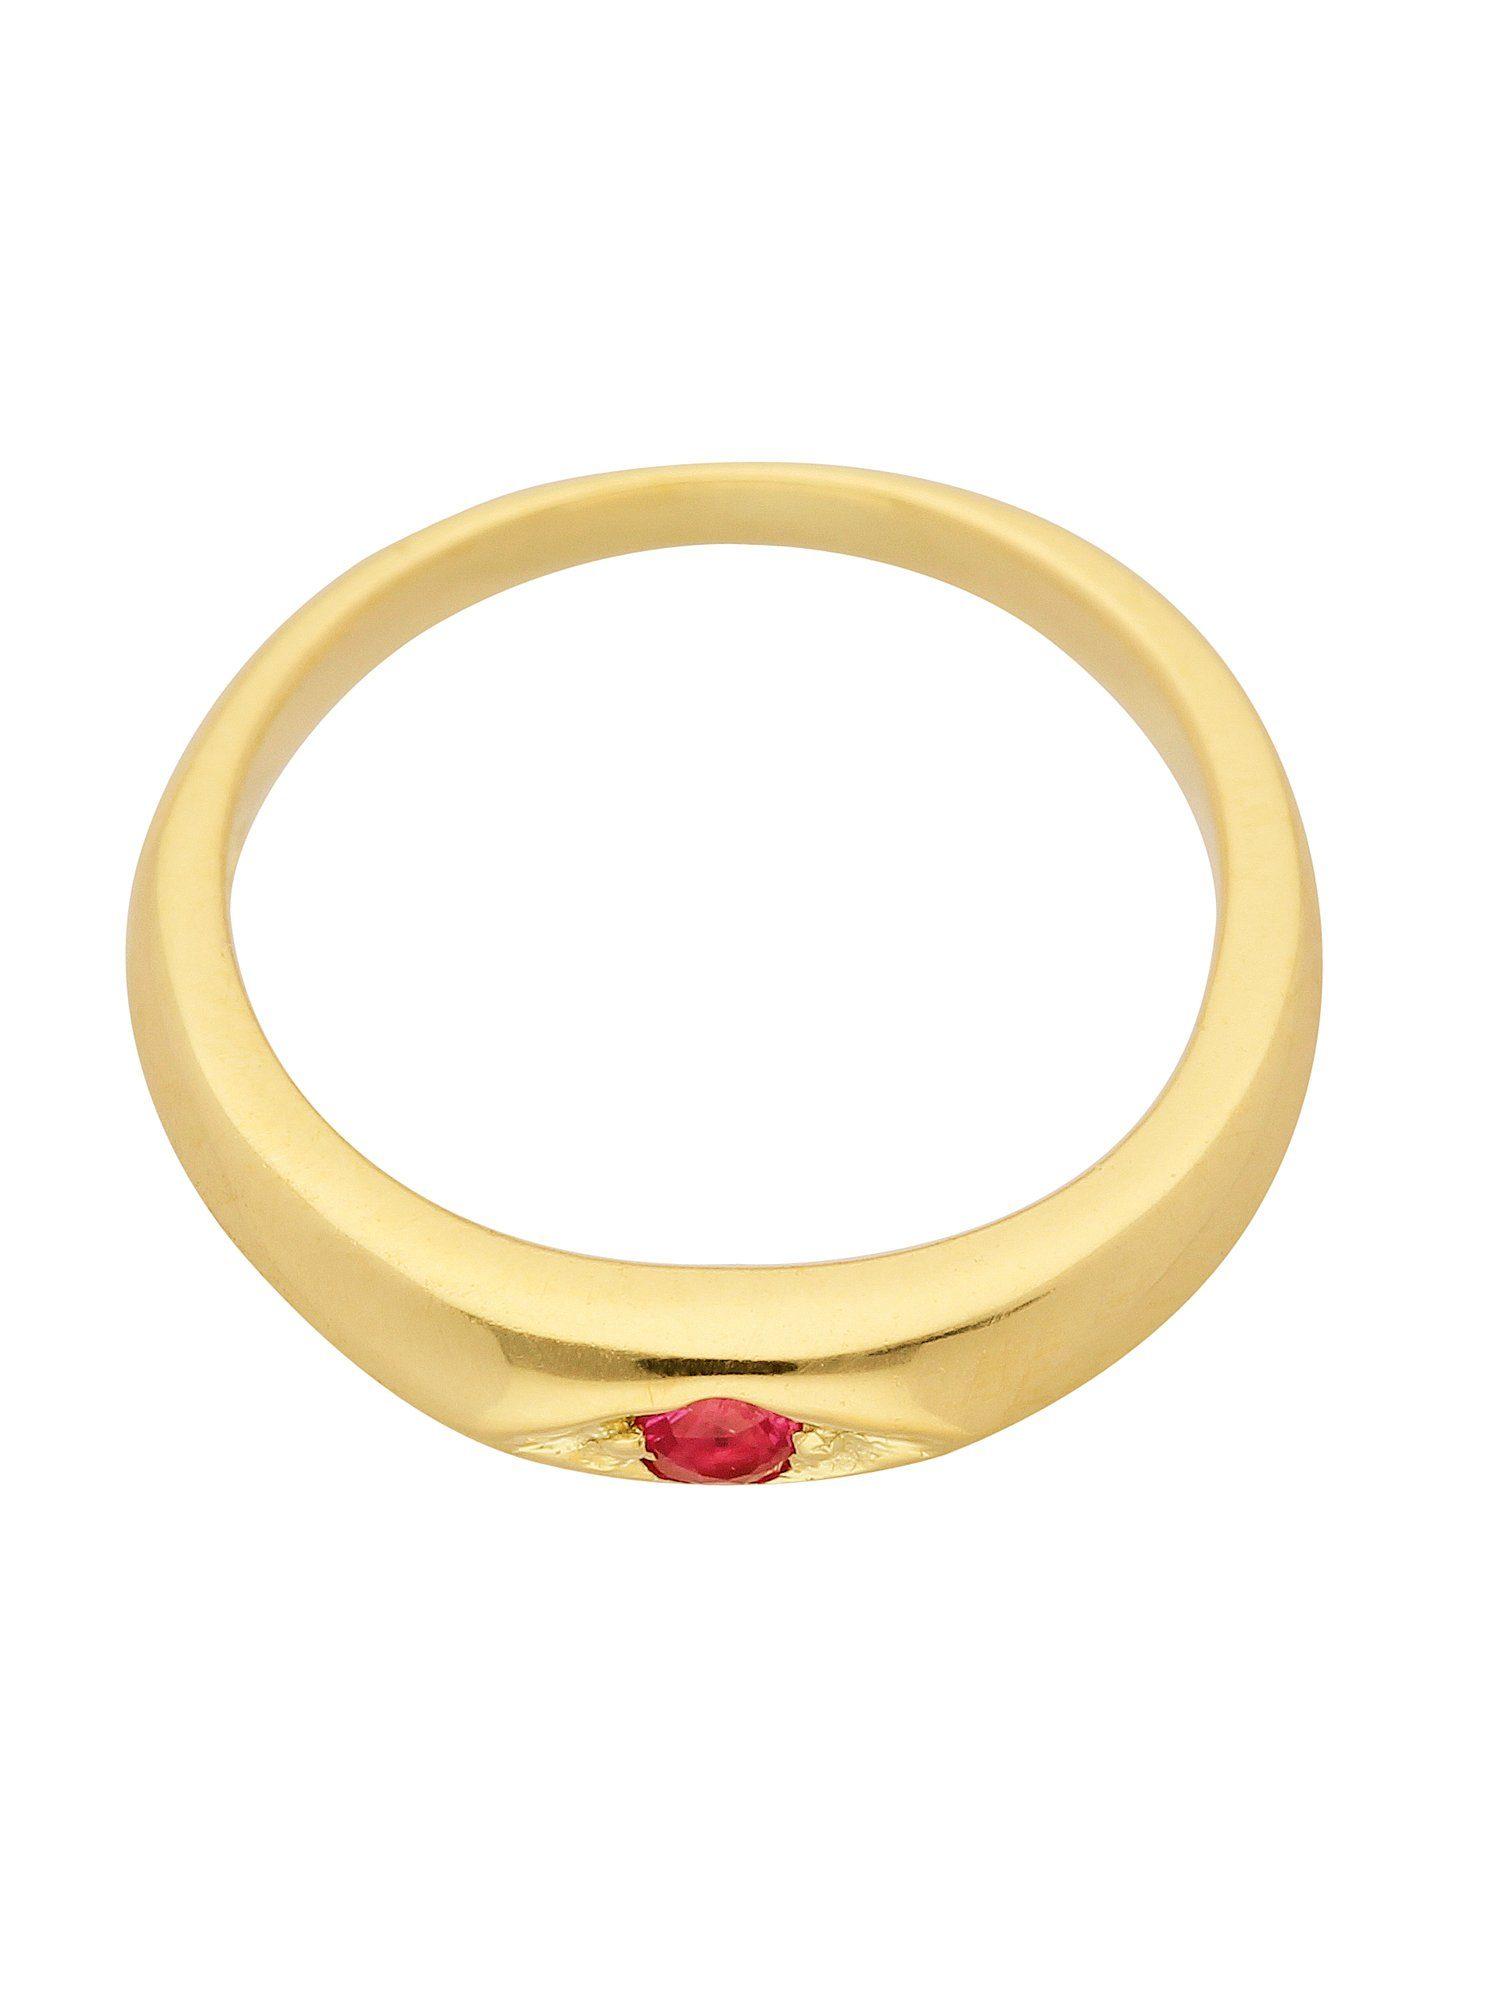 Adelia´s Kettenanhänger »Gold Anhänger«, Taufring mit Rubin